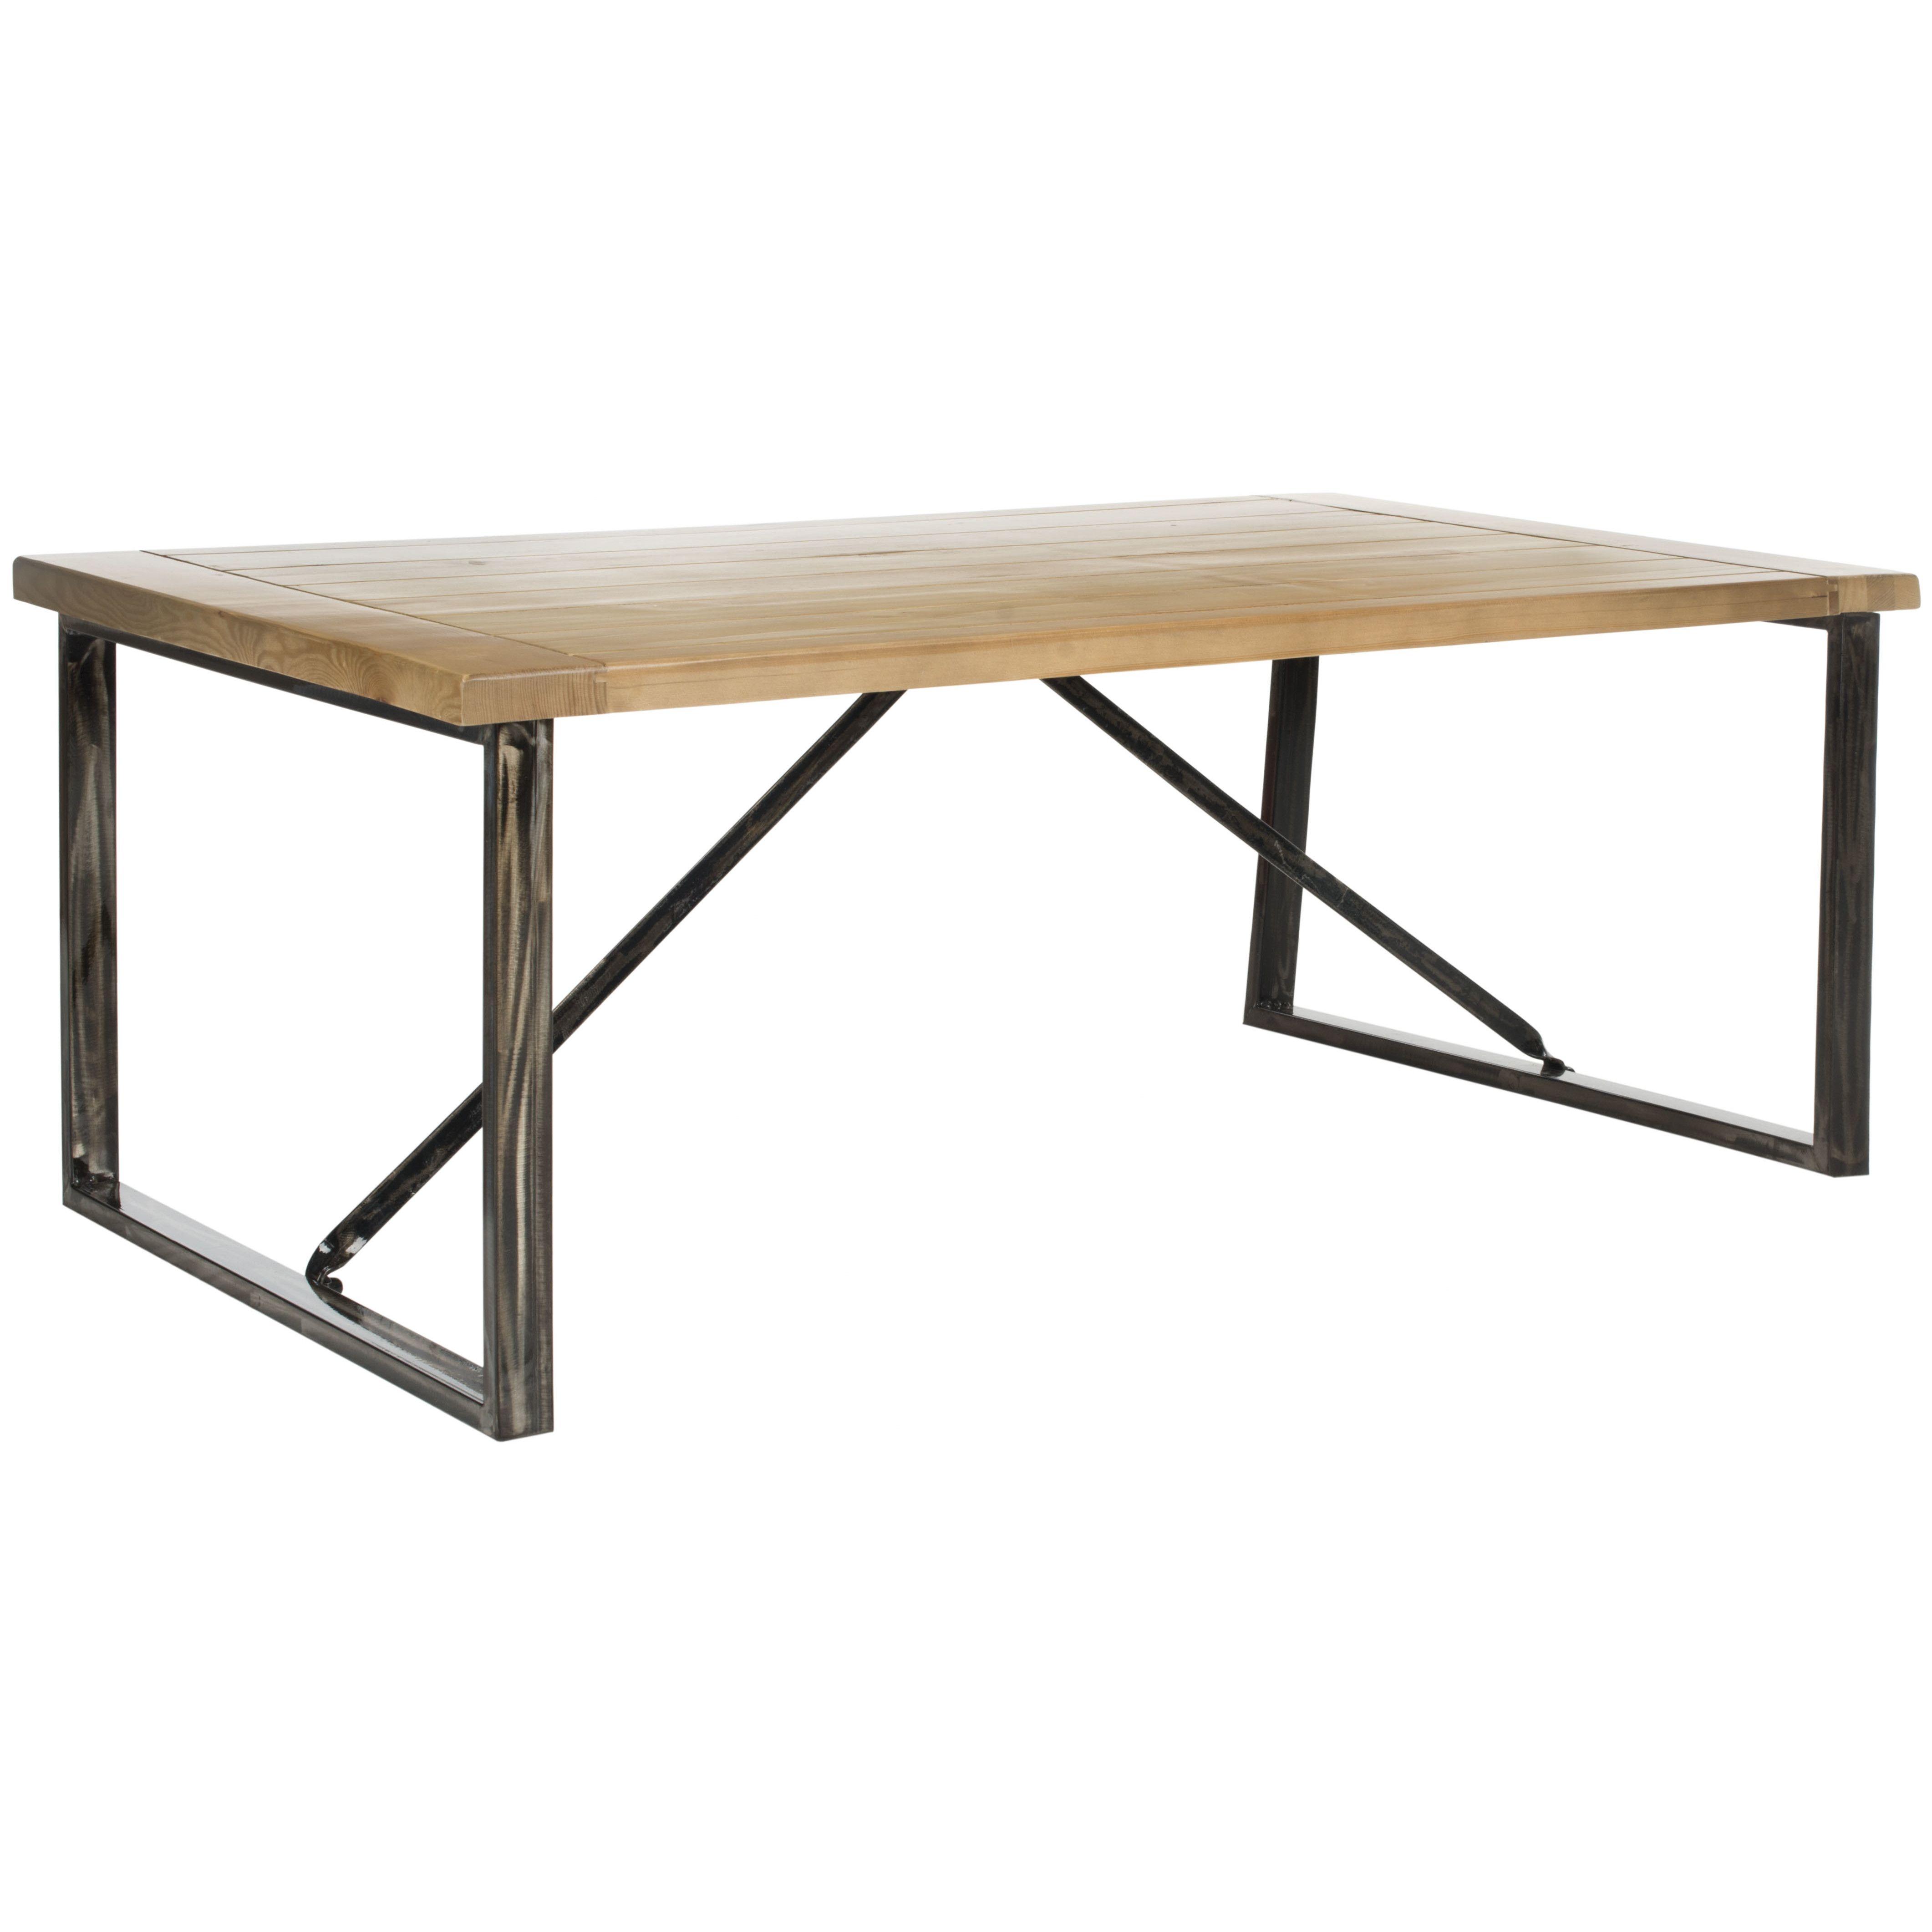 chase coffee table 215 randolph pinterest coffee